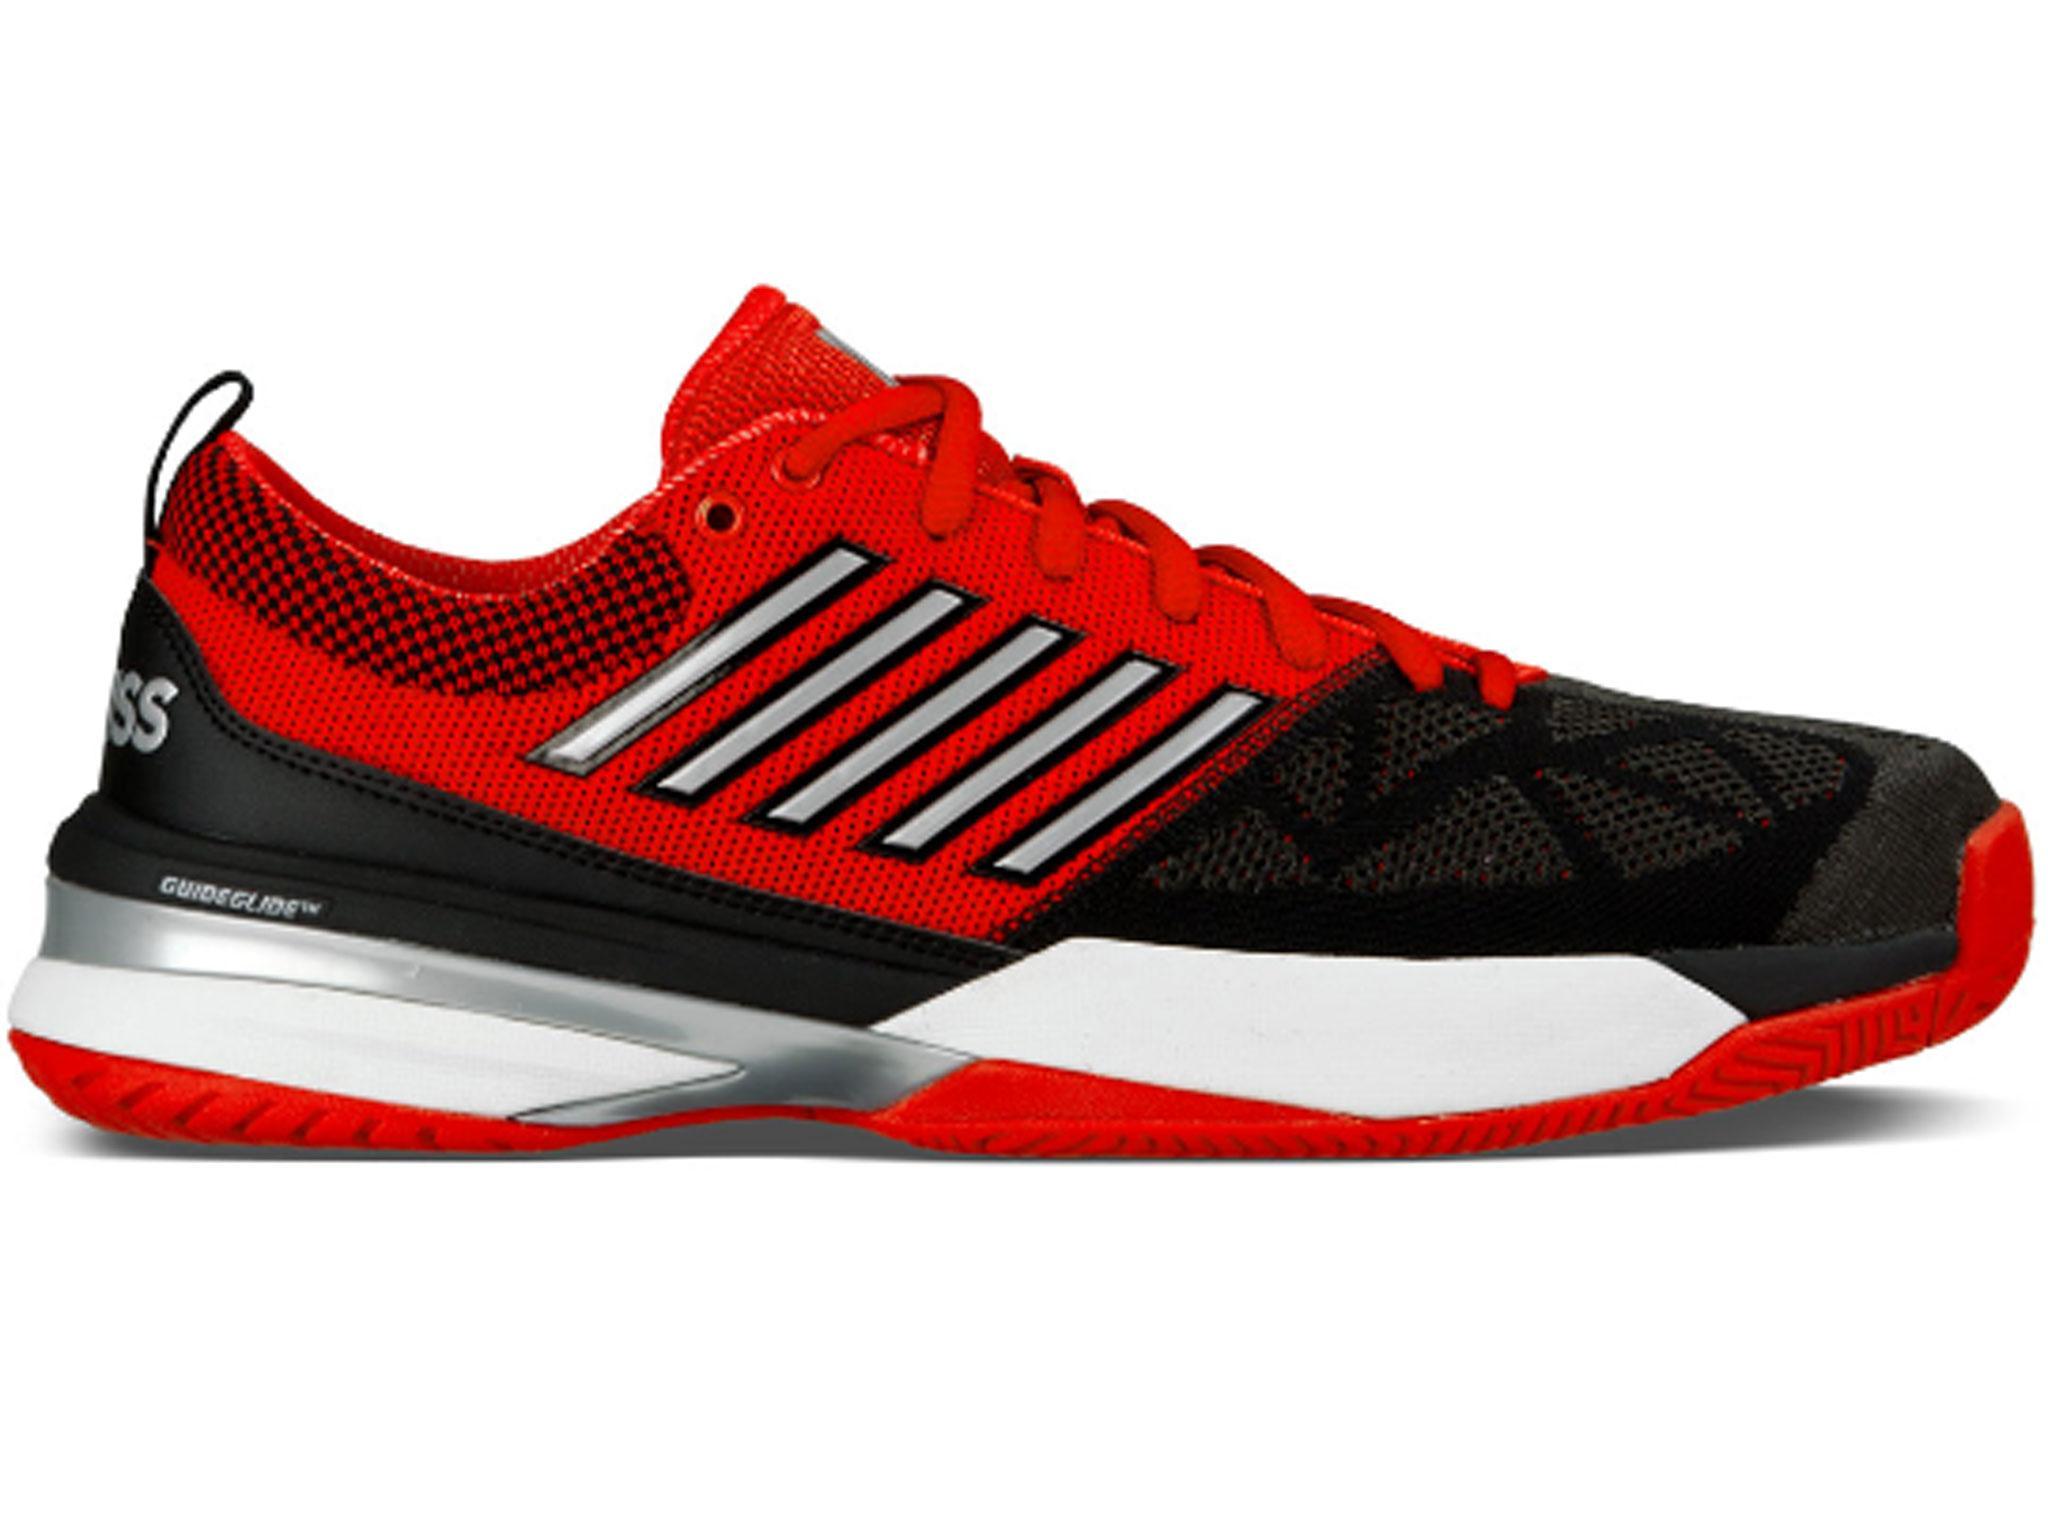 new balance 996v2 tennis shoes £80 new balance